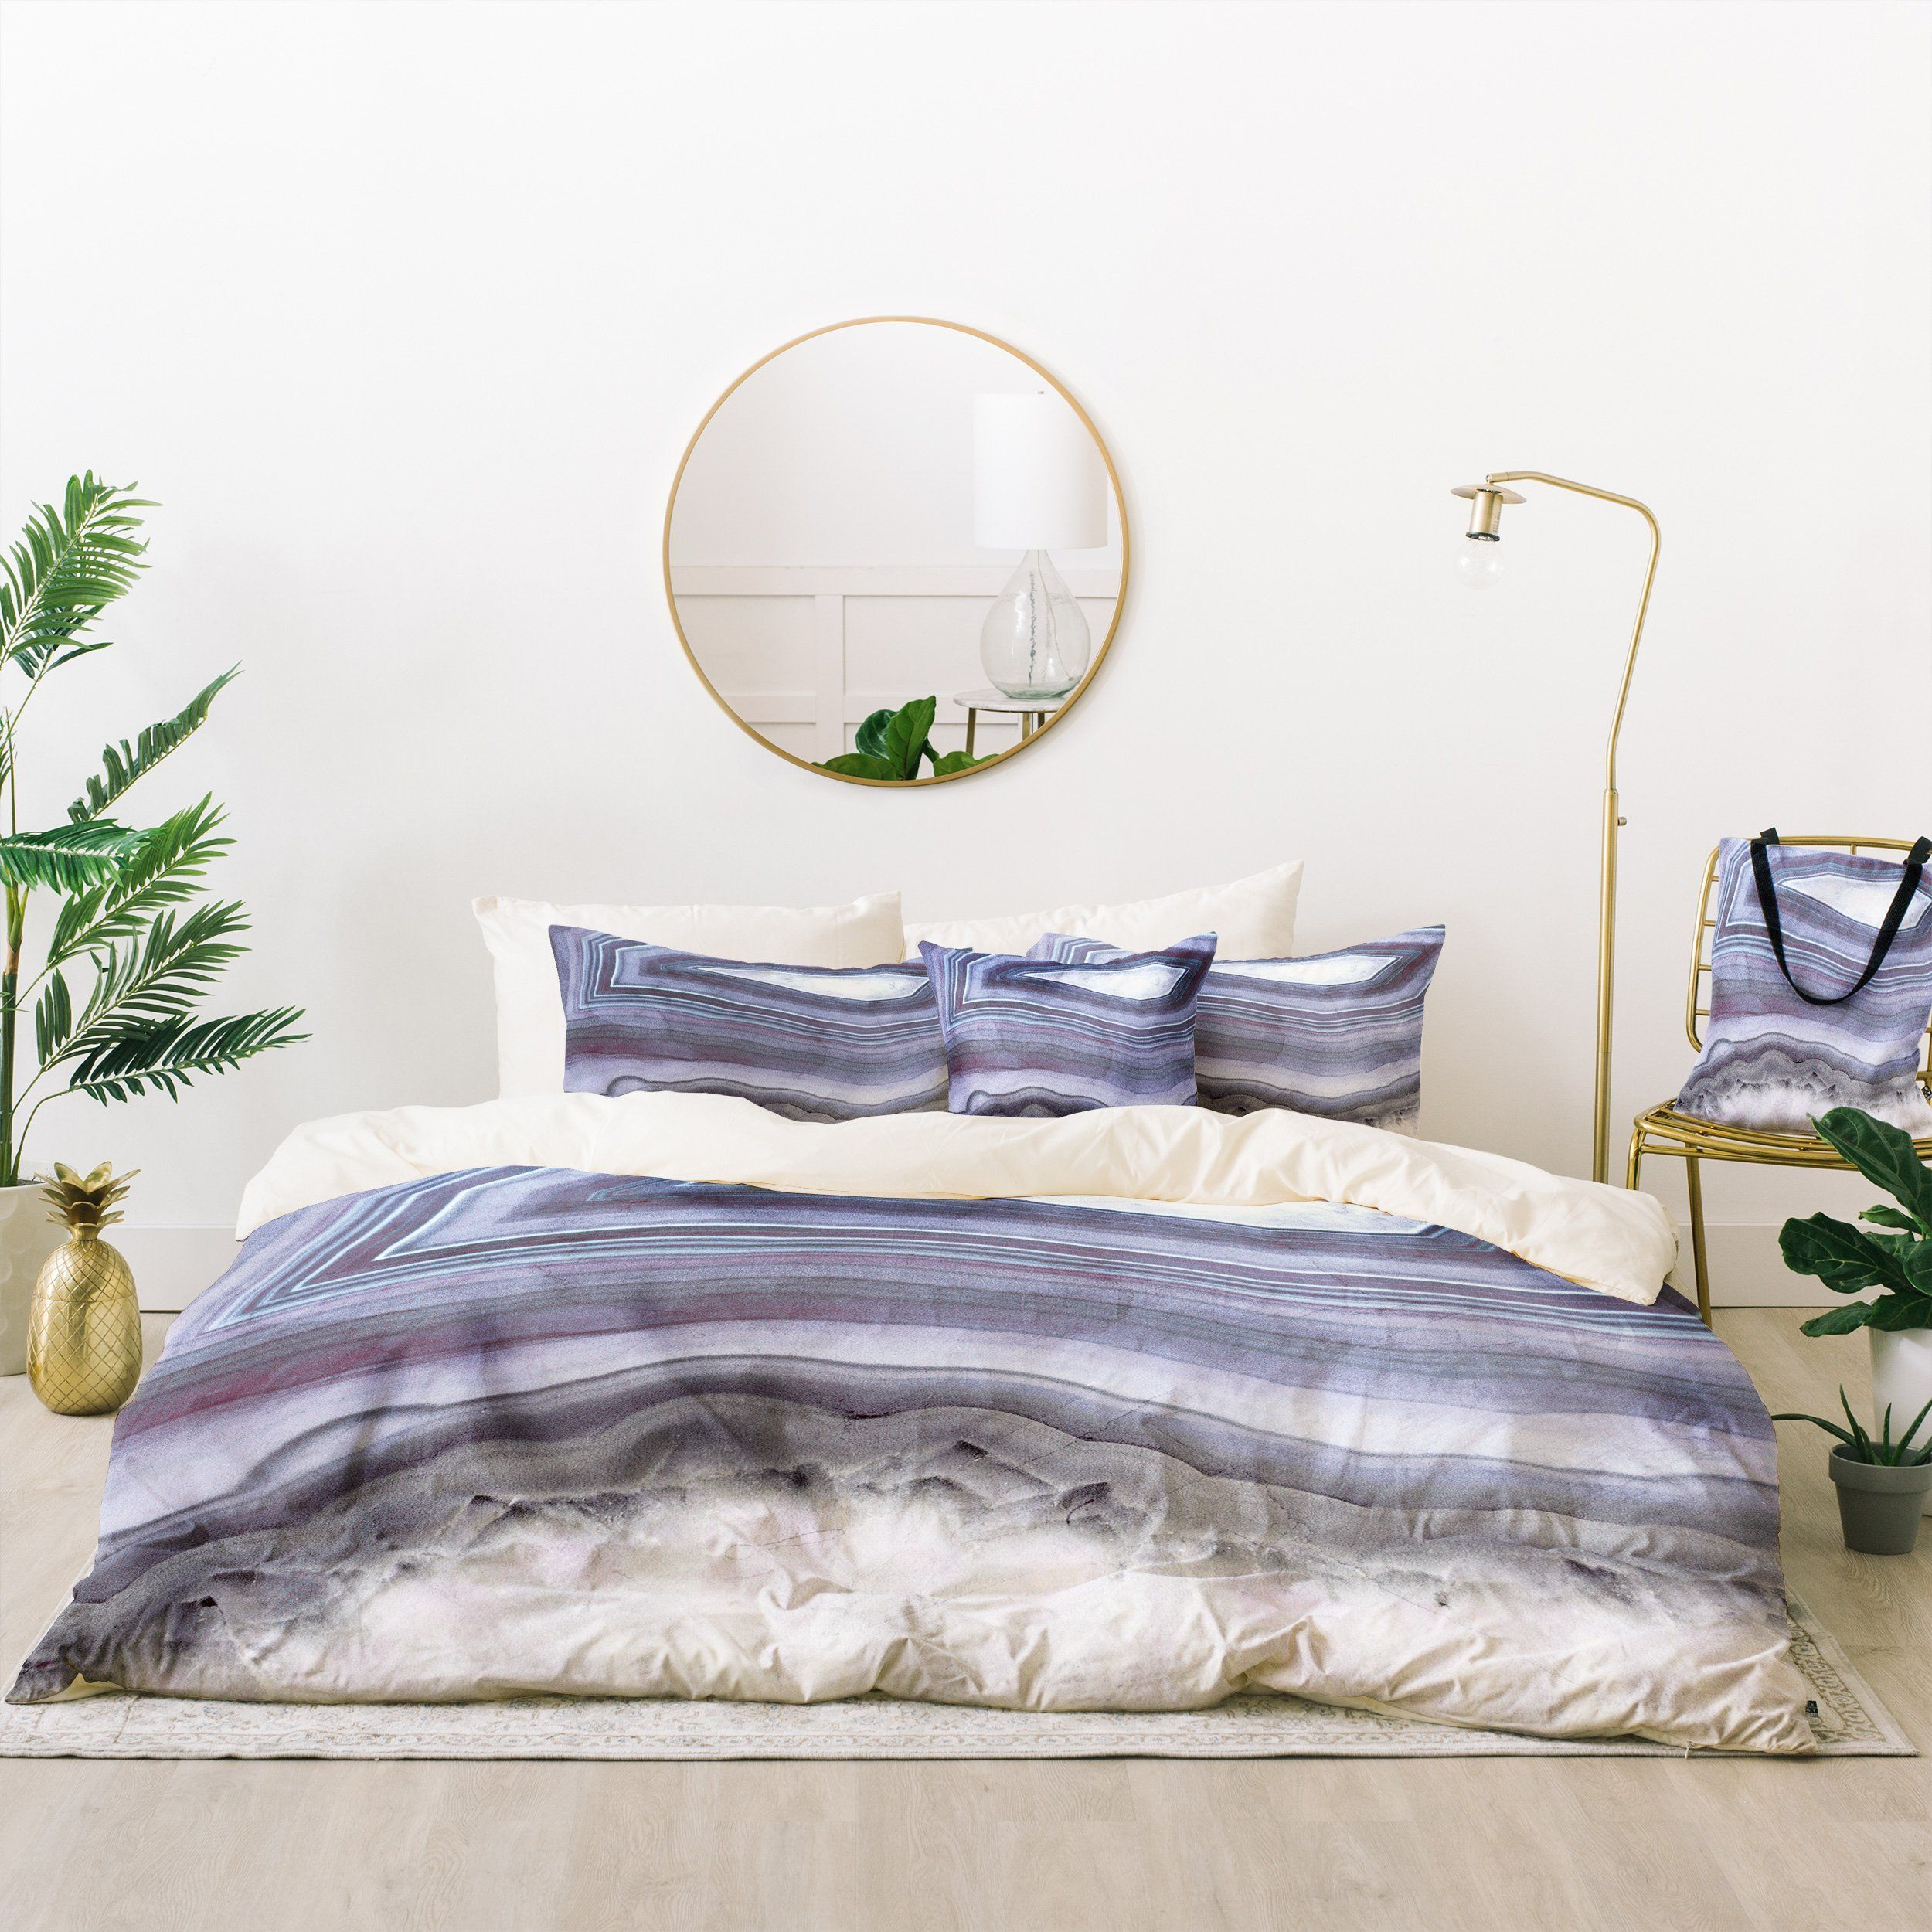 Emanuela Carratoni Winter Agate Bed In A Bag Deny